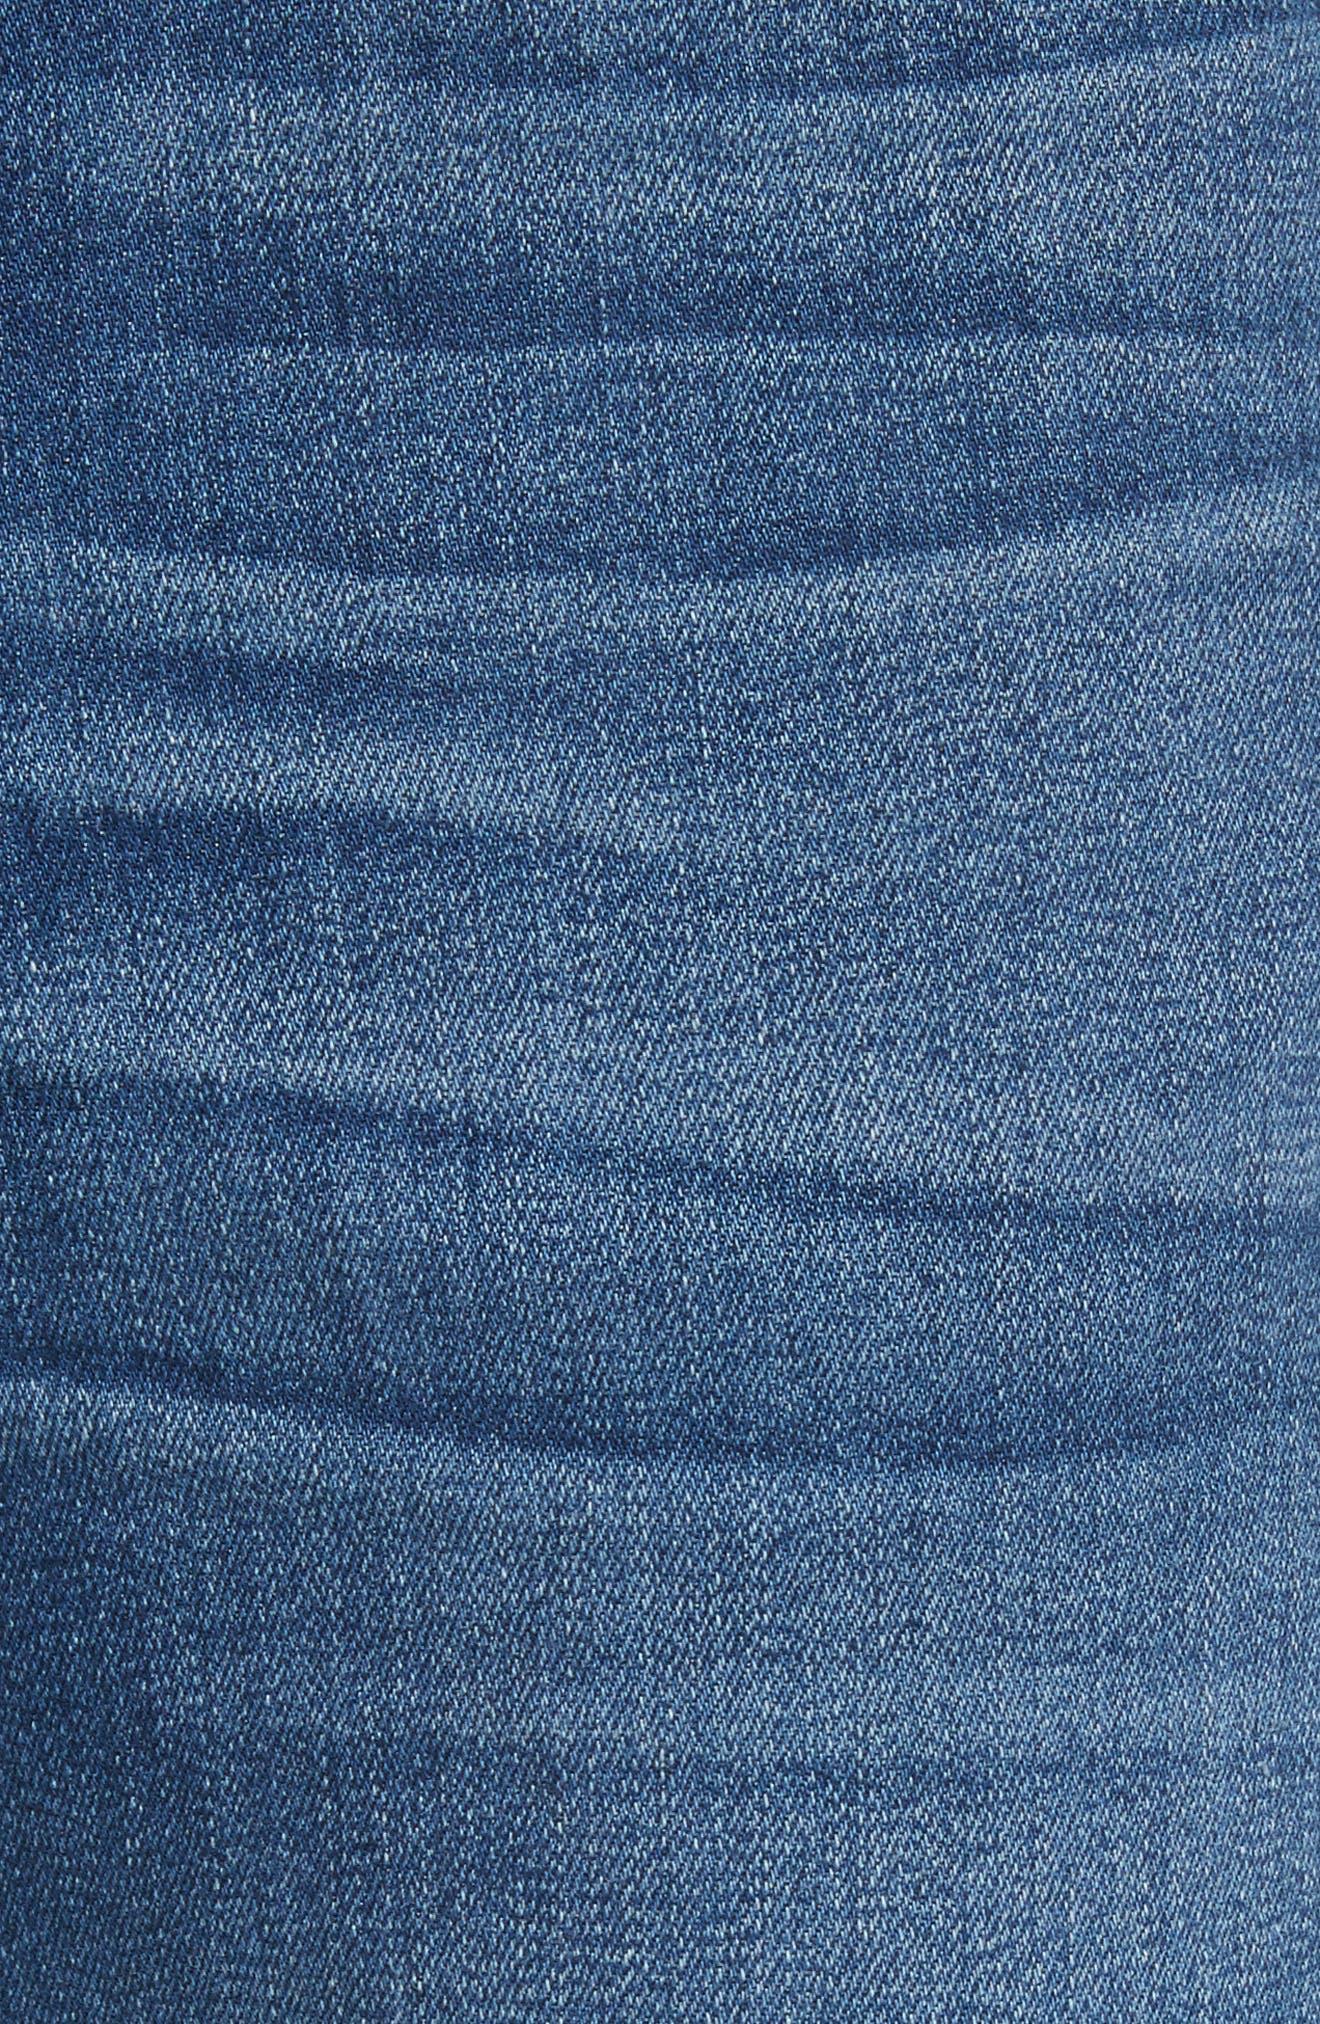 W4 Adeline High Waist Split Flare Jeans,                             Alternate thumbnail 5, color,                             Leia